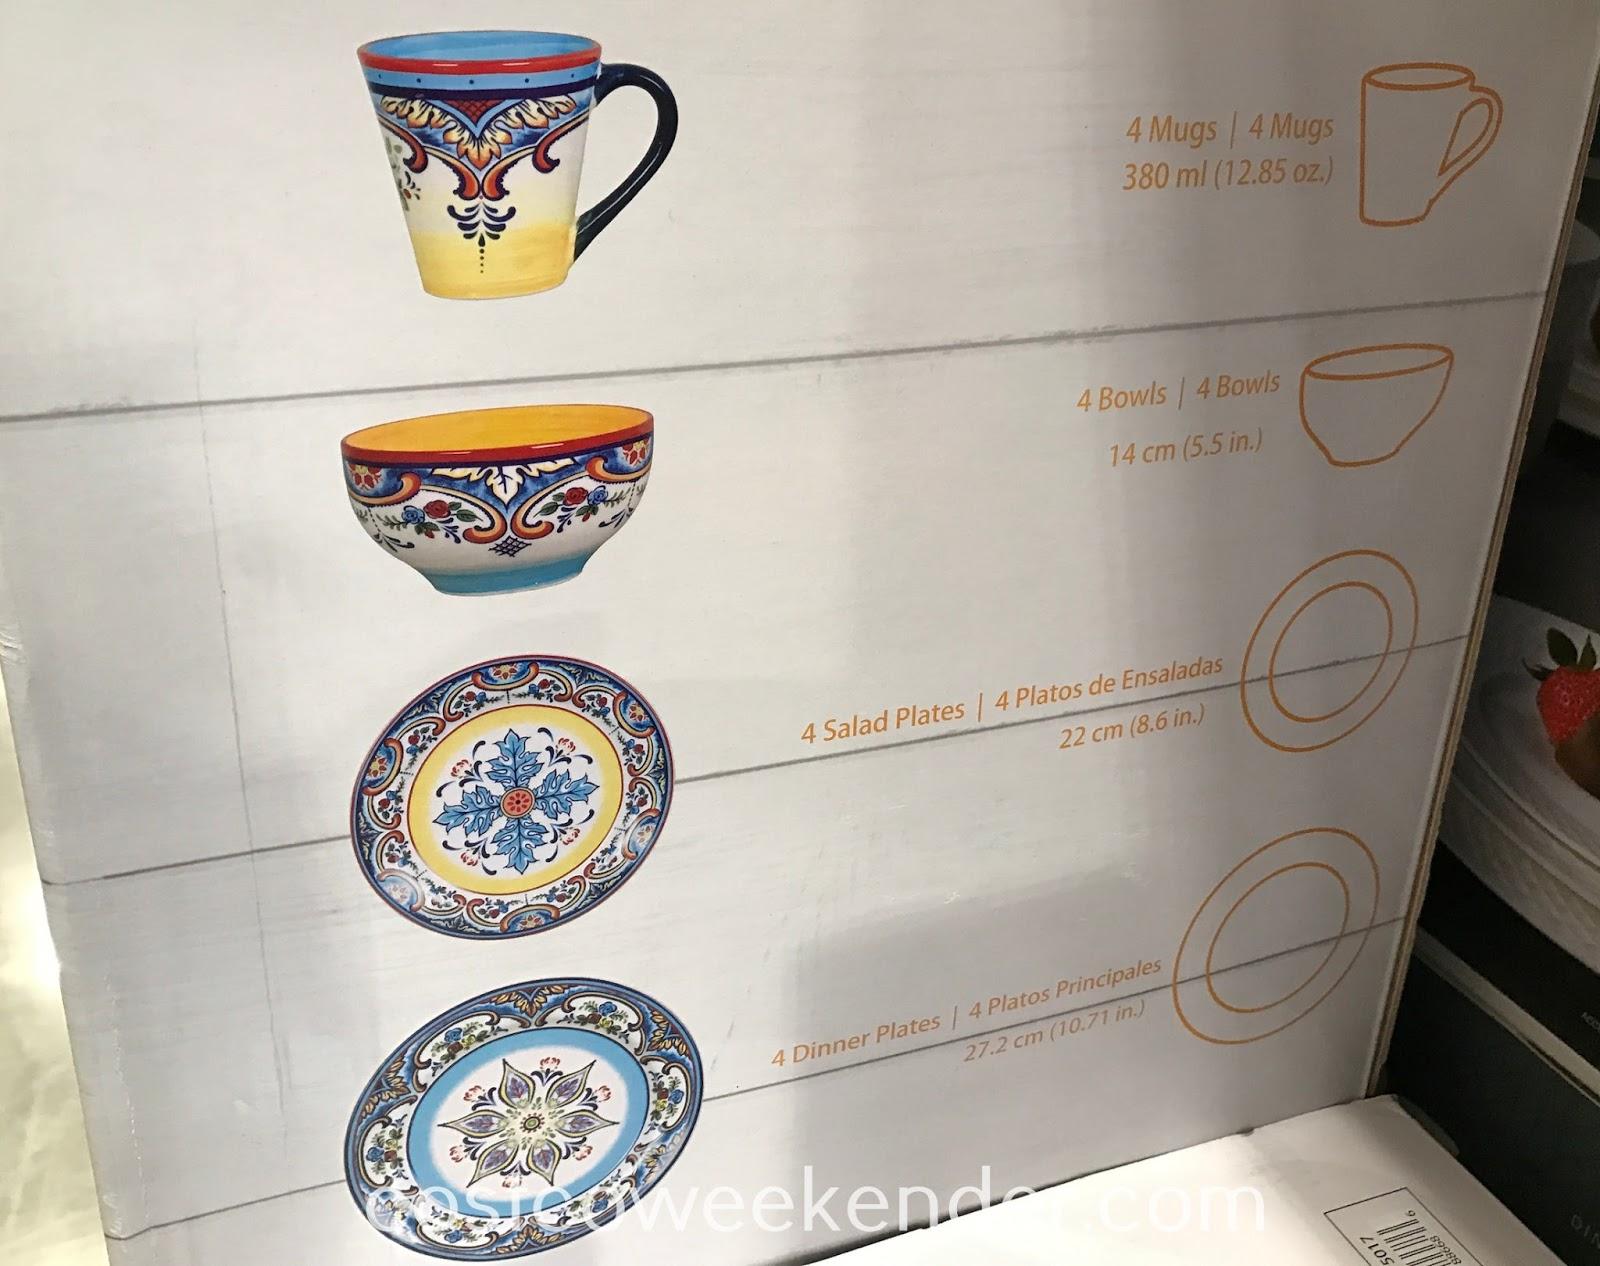 Costco 1075017 - Euro Ceramica Zanzibar 16 Piece Dinnerware Set: great for any meal